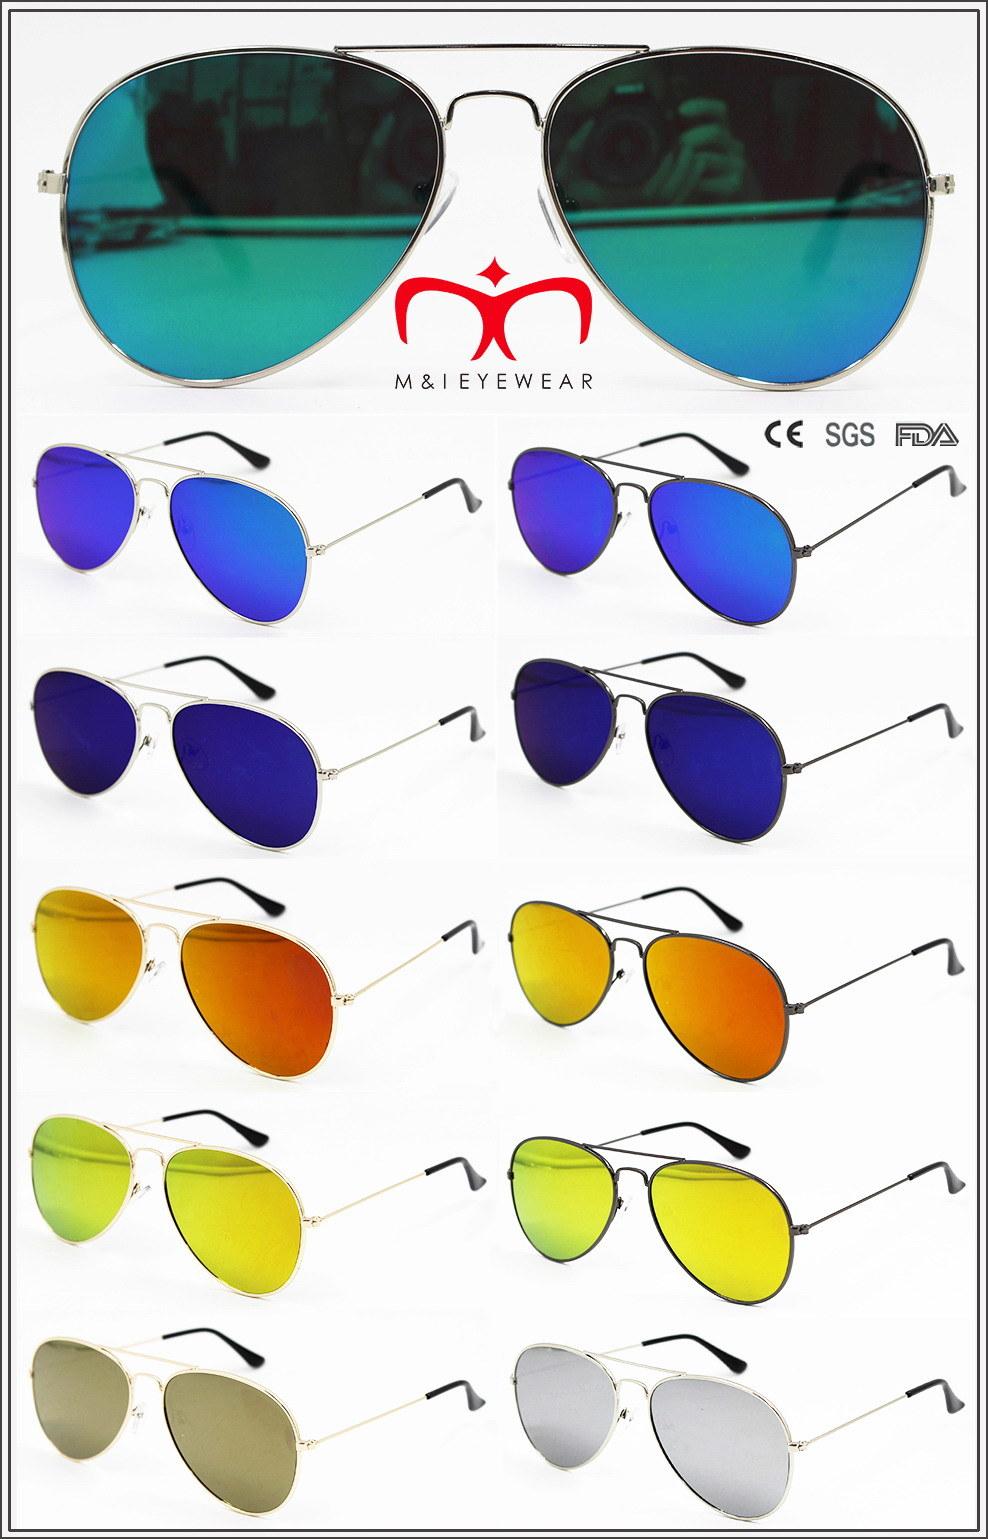 2016 New Metal Sunglasses with Flat Lens (MI160223)